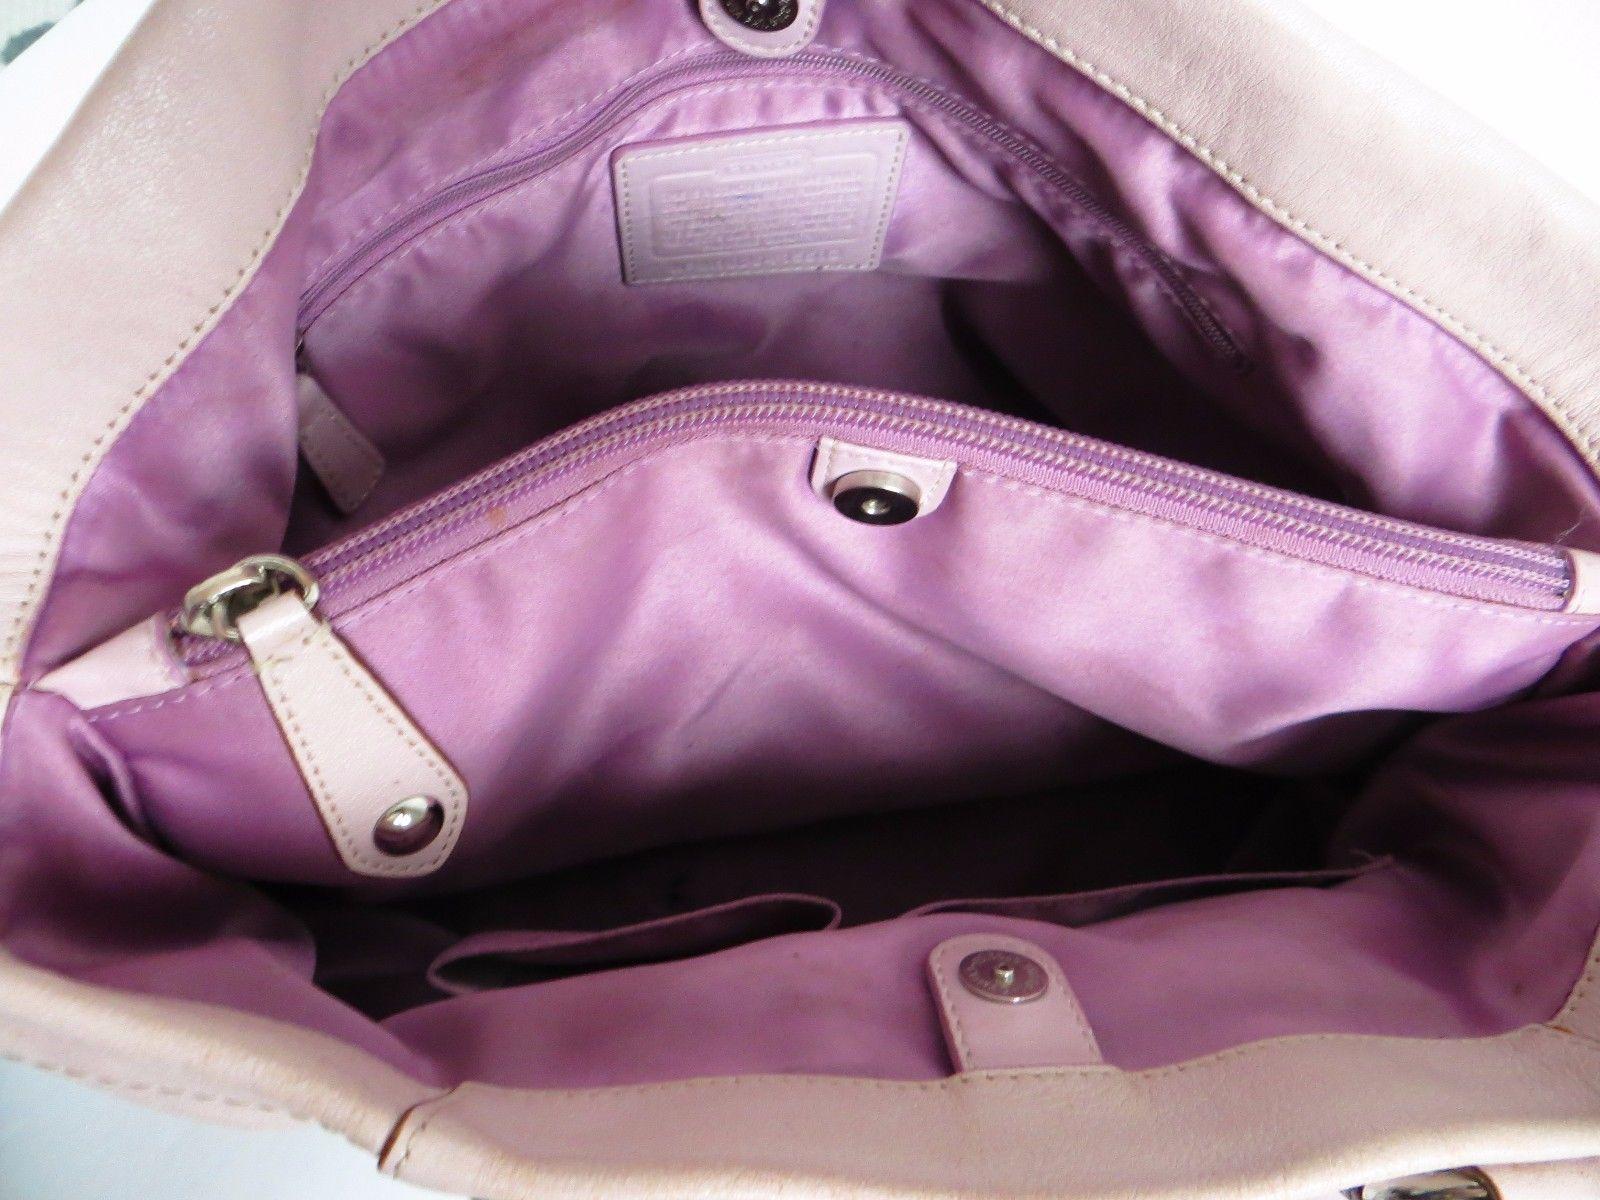 832587e746 ... cheapest coach ashley lilac leather carryall satchel shoulder bag purse  crossbody pink eeed6 7b0b0 ...